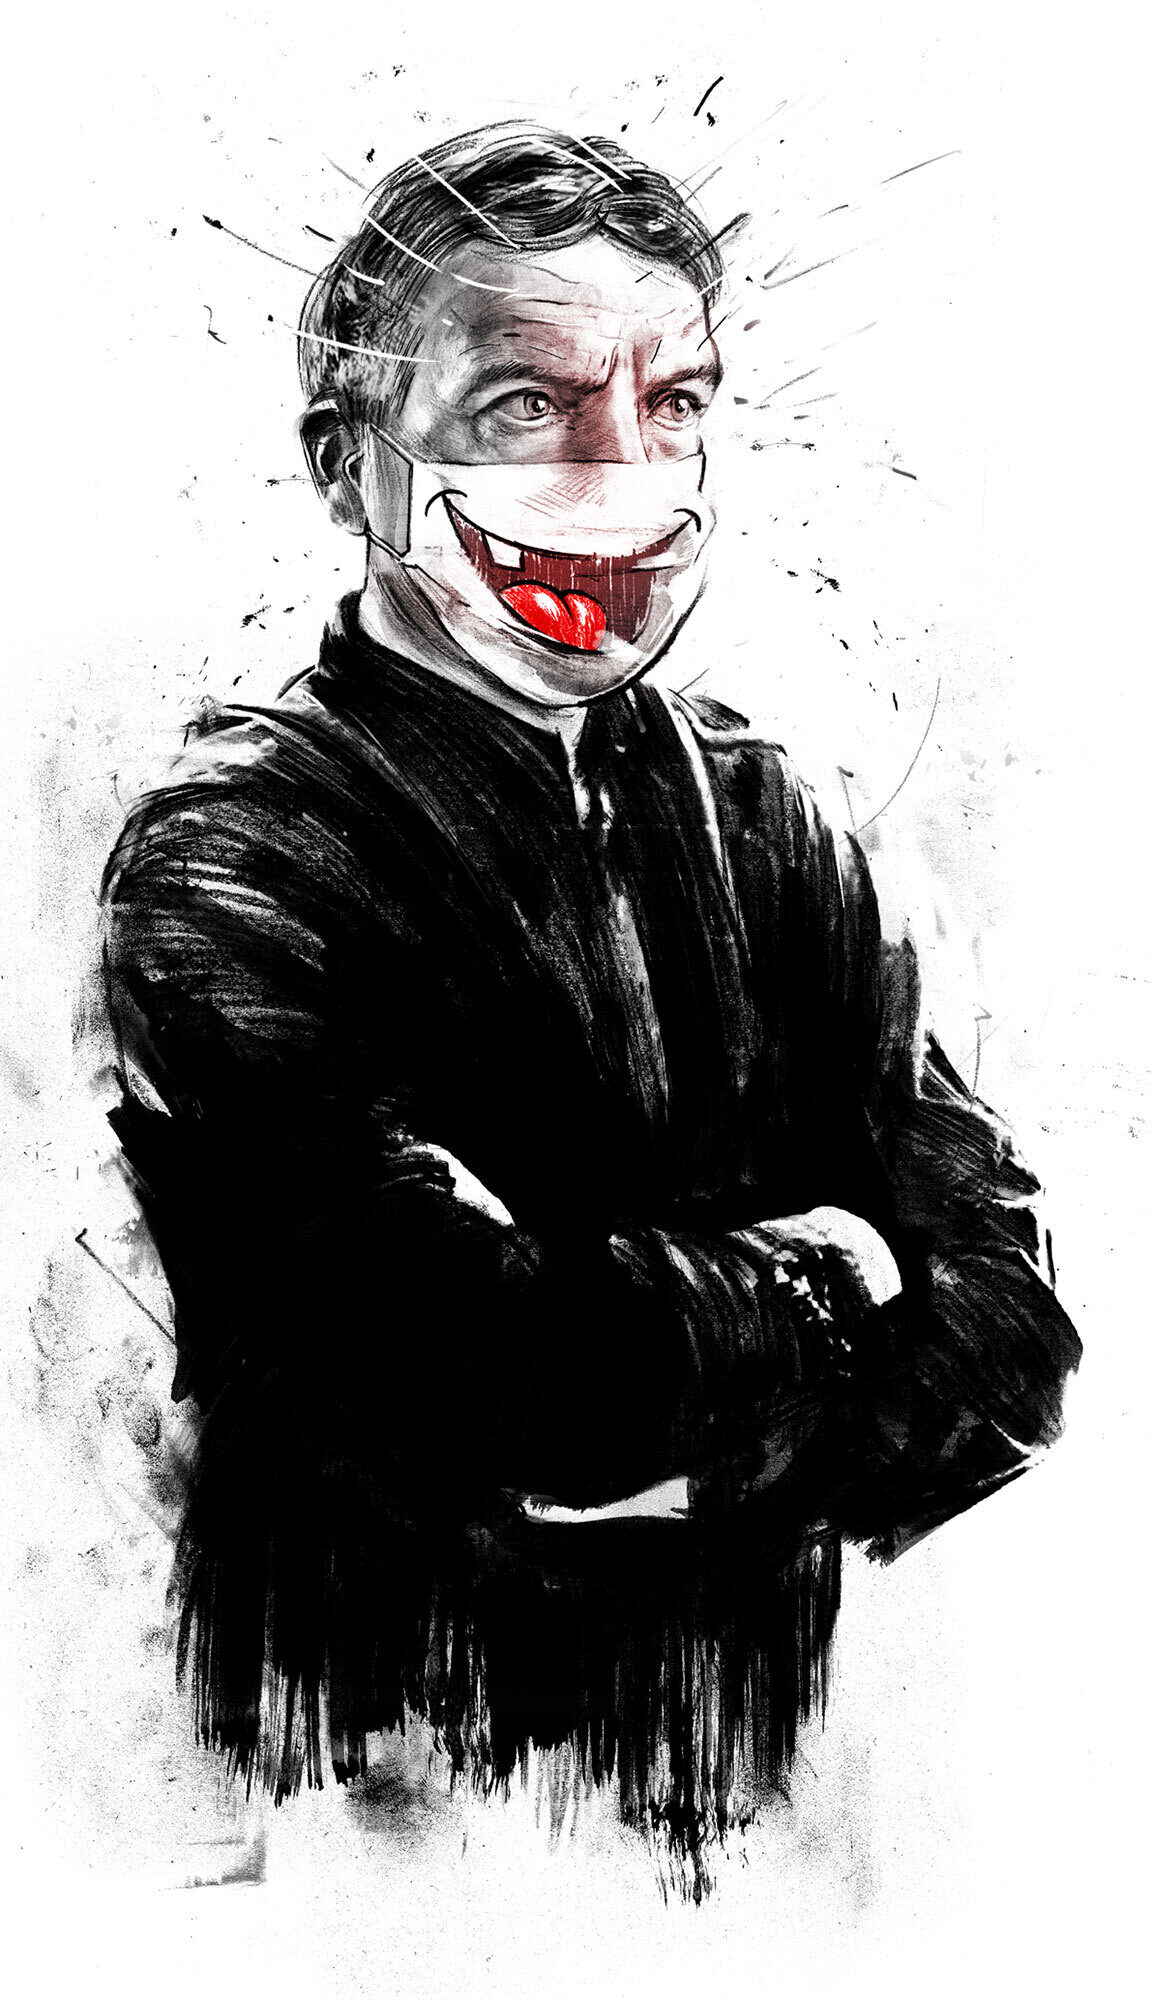 Corona smile - Kornel Illustration   Kornel Stadler portfolio